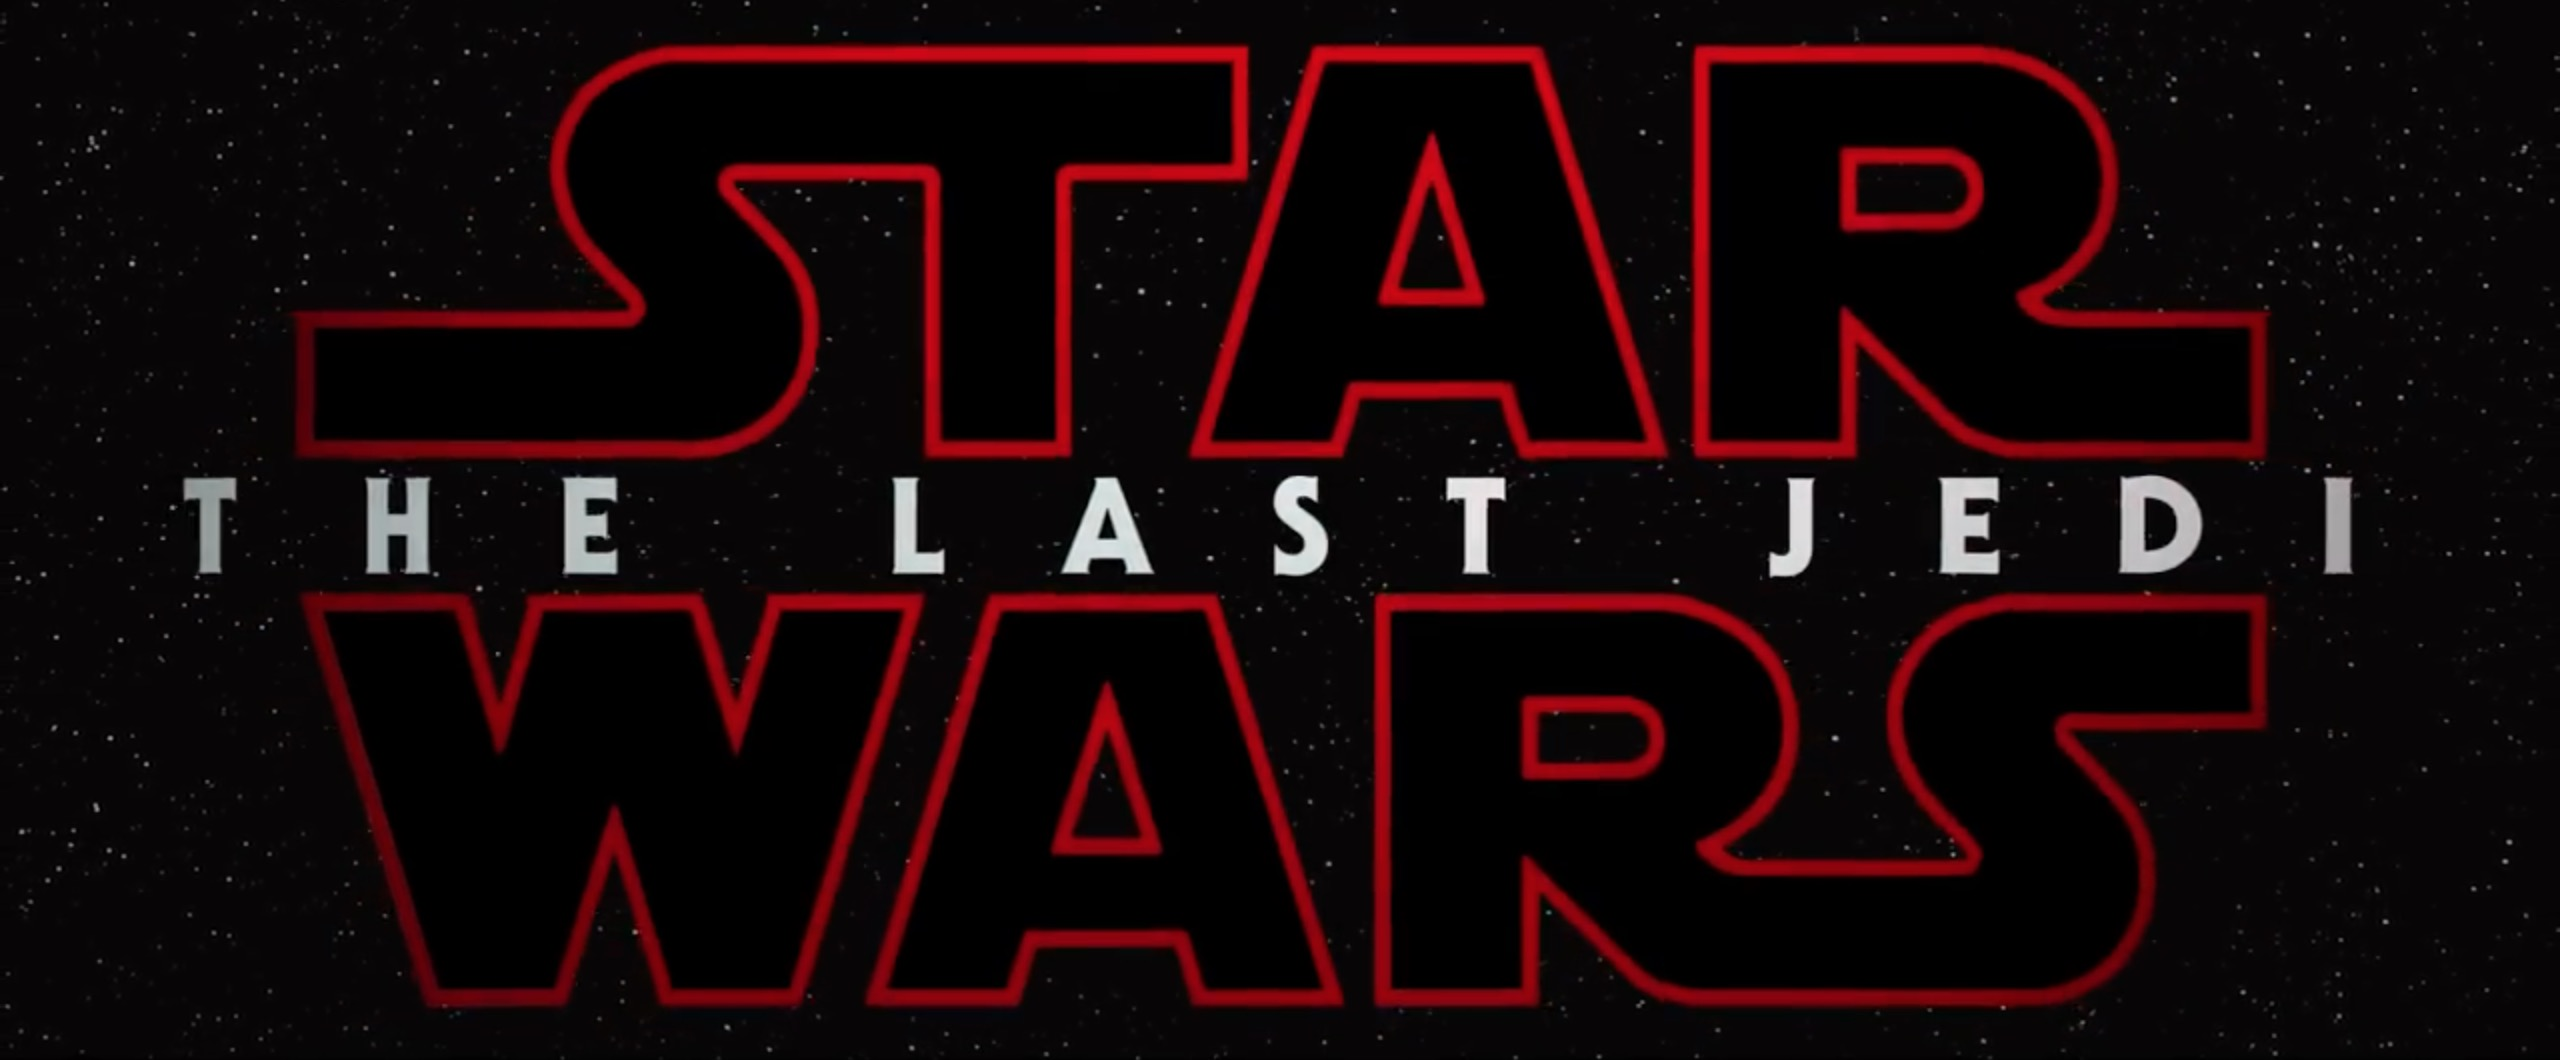 Star Wars The Last Jedi Trailer Breakdown - photo#50